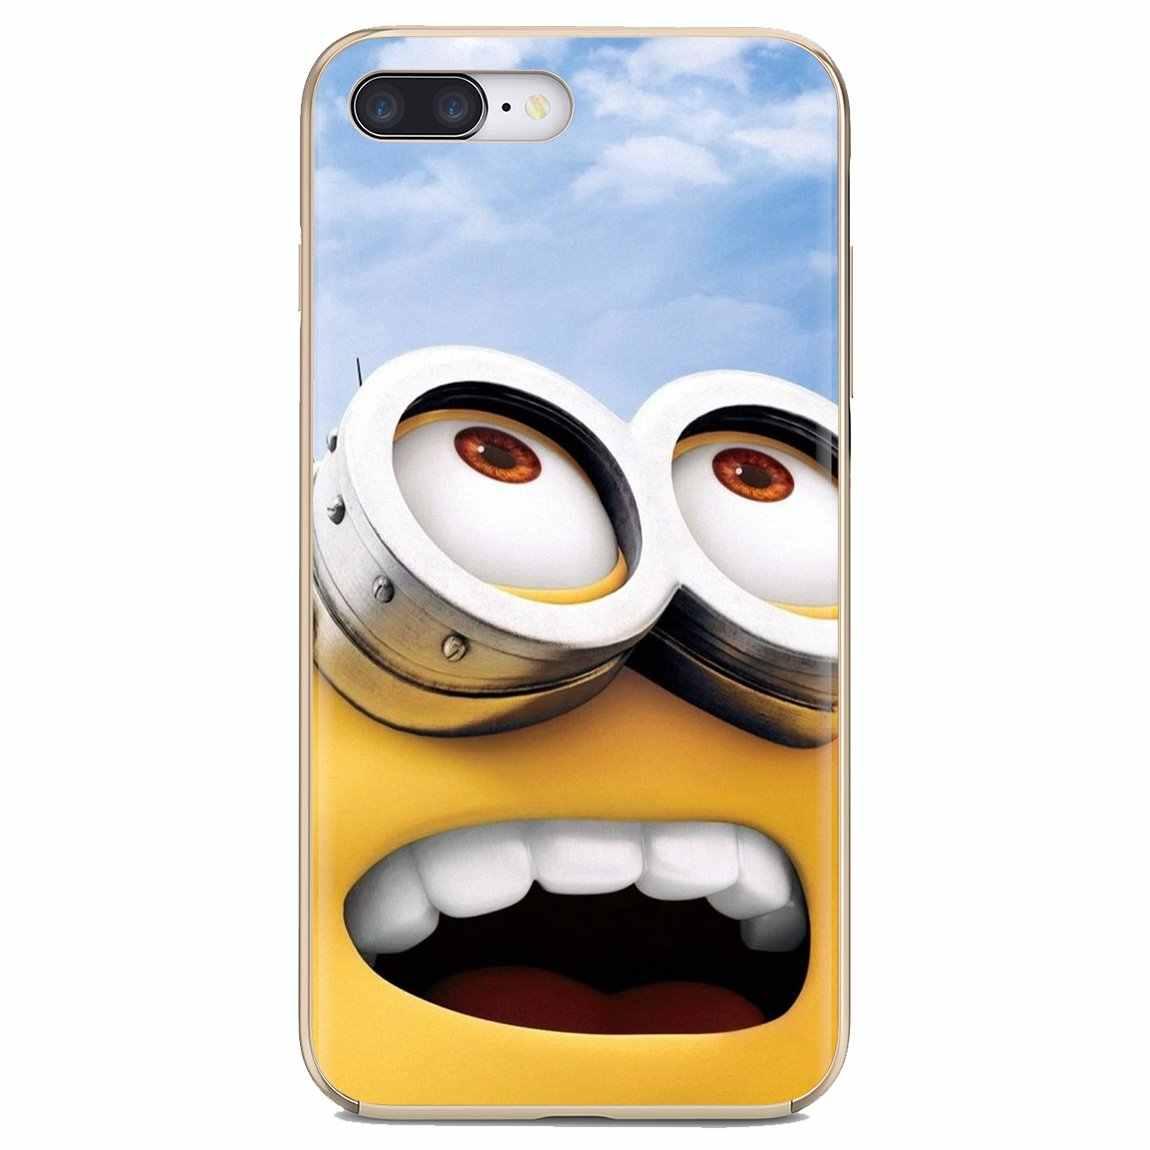 Cartoon Despicable Me Yellow Minions Silicone Case For Samsung Galaxy J1 J2 J3 J4 J5 J6 J7 J8 Plus 2018 Prime 2015 2016 2017